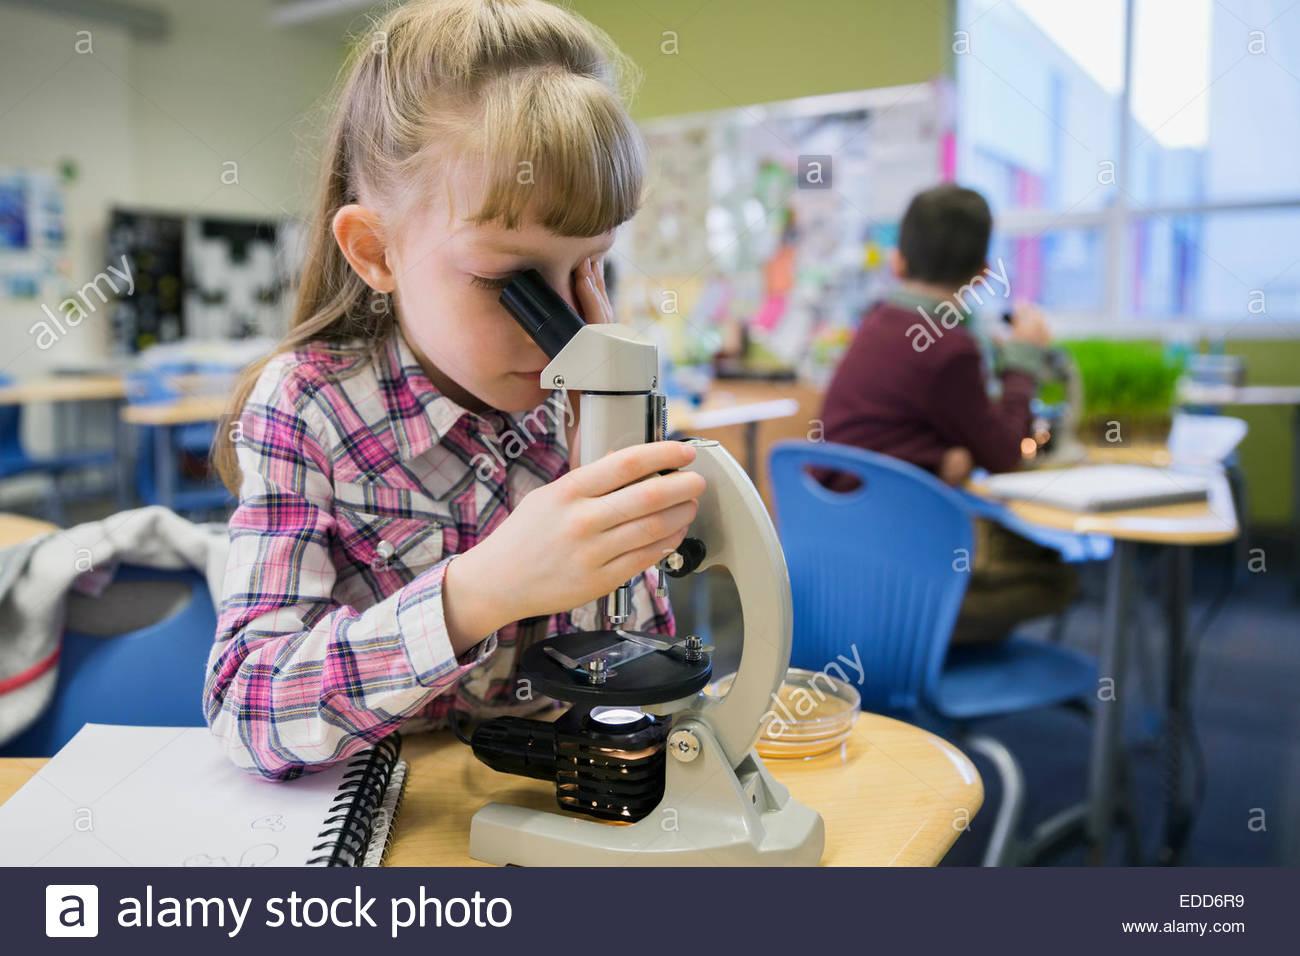 Elementary student using microscope in laboratory - Stock Image